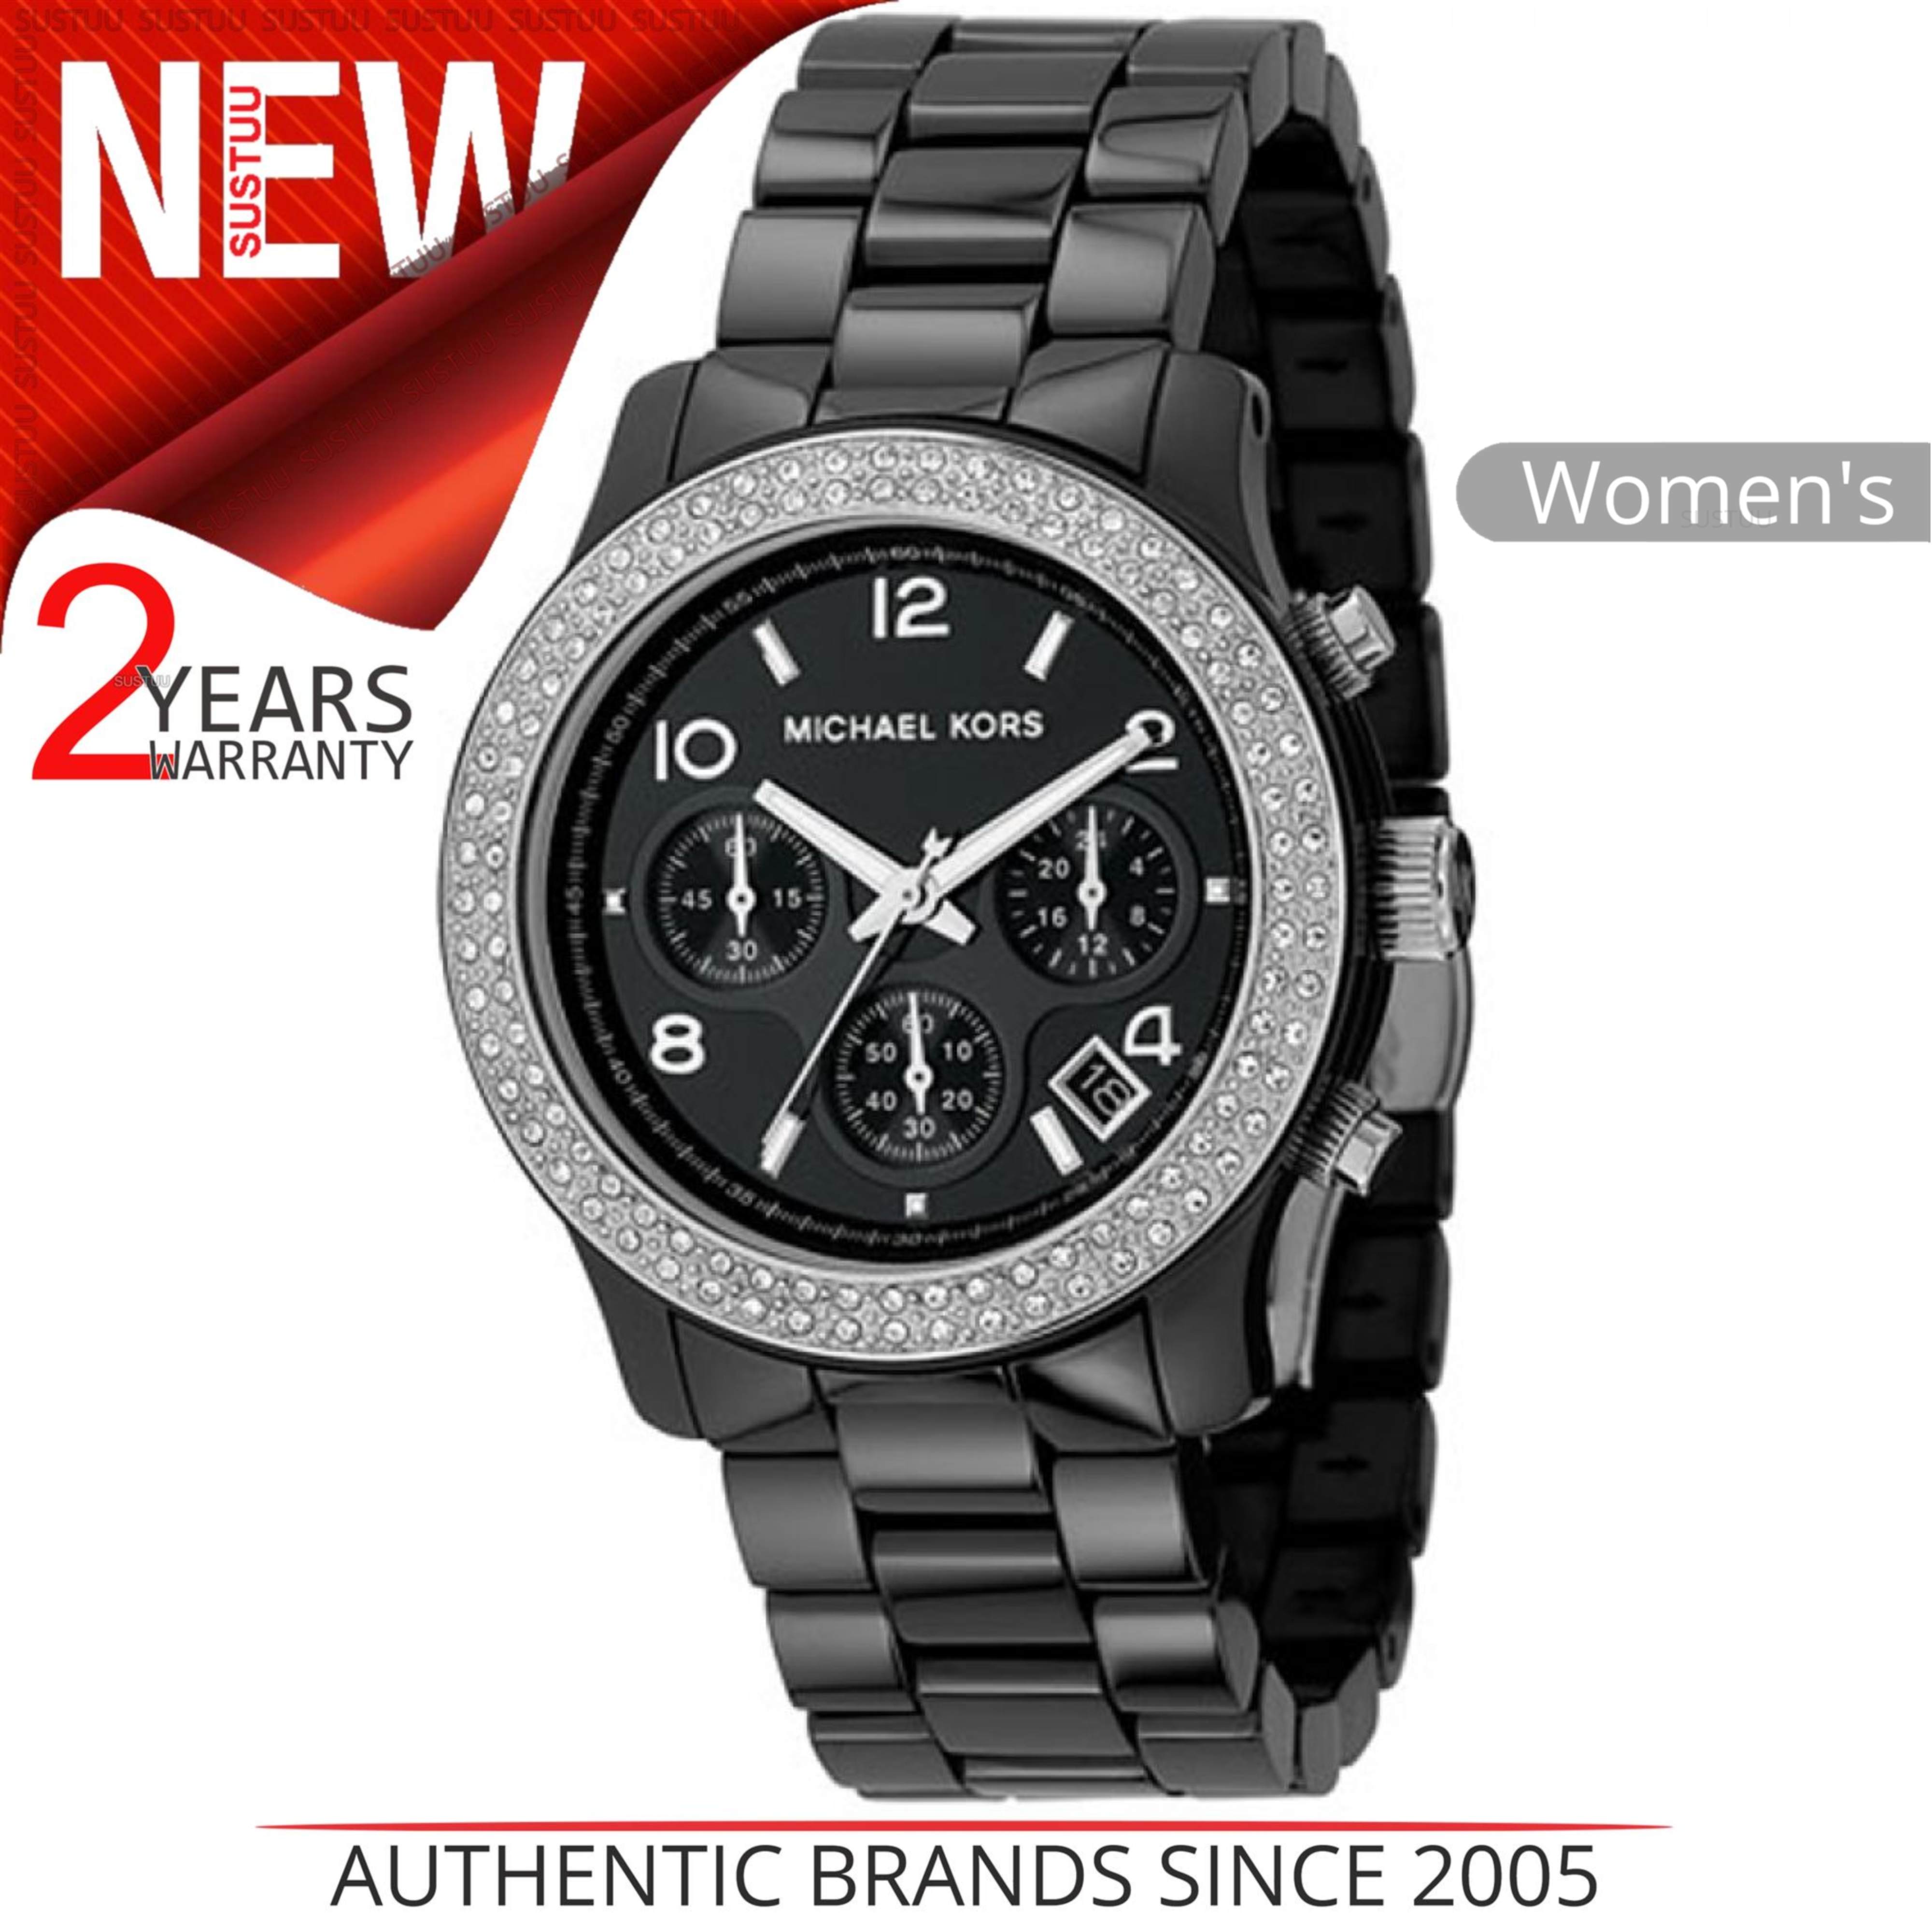 Michael Kors Ladies' Black Ceramic Bracelet Round Dial Designer Watch MK5190